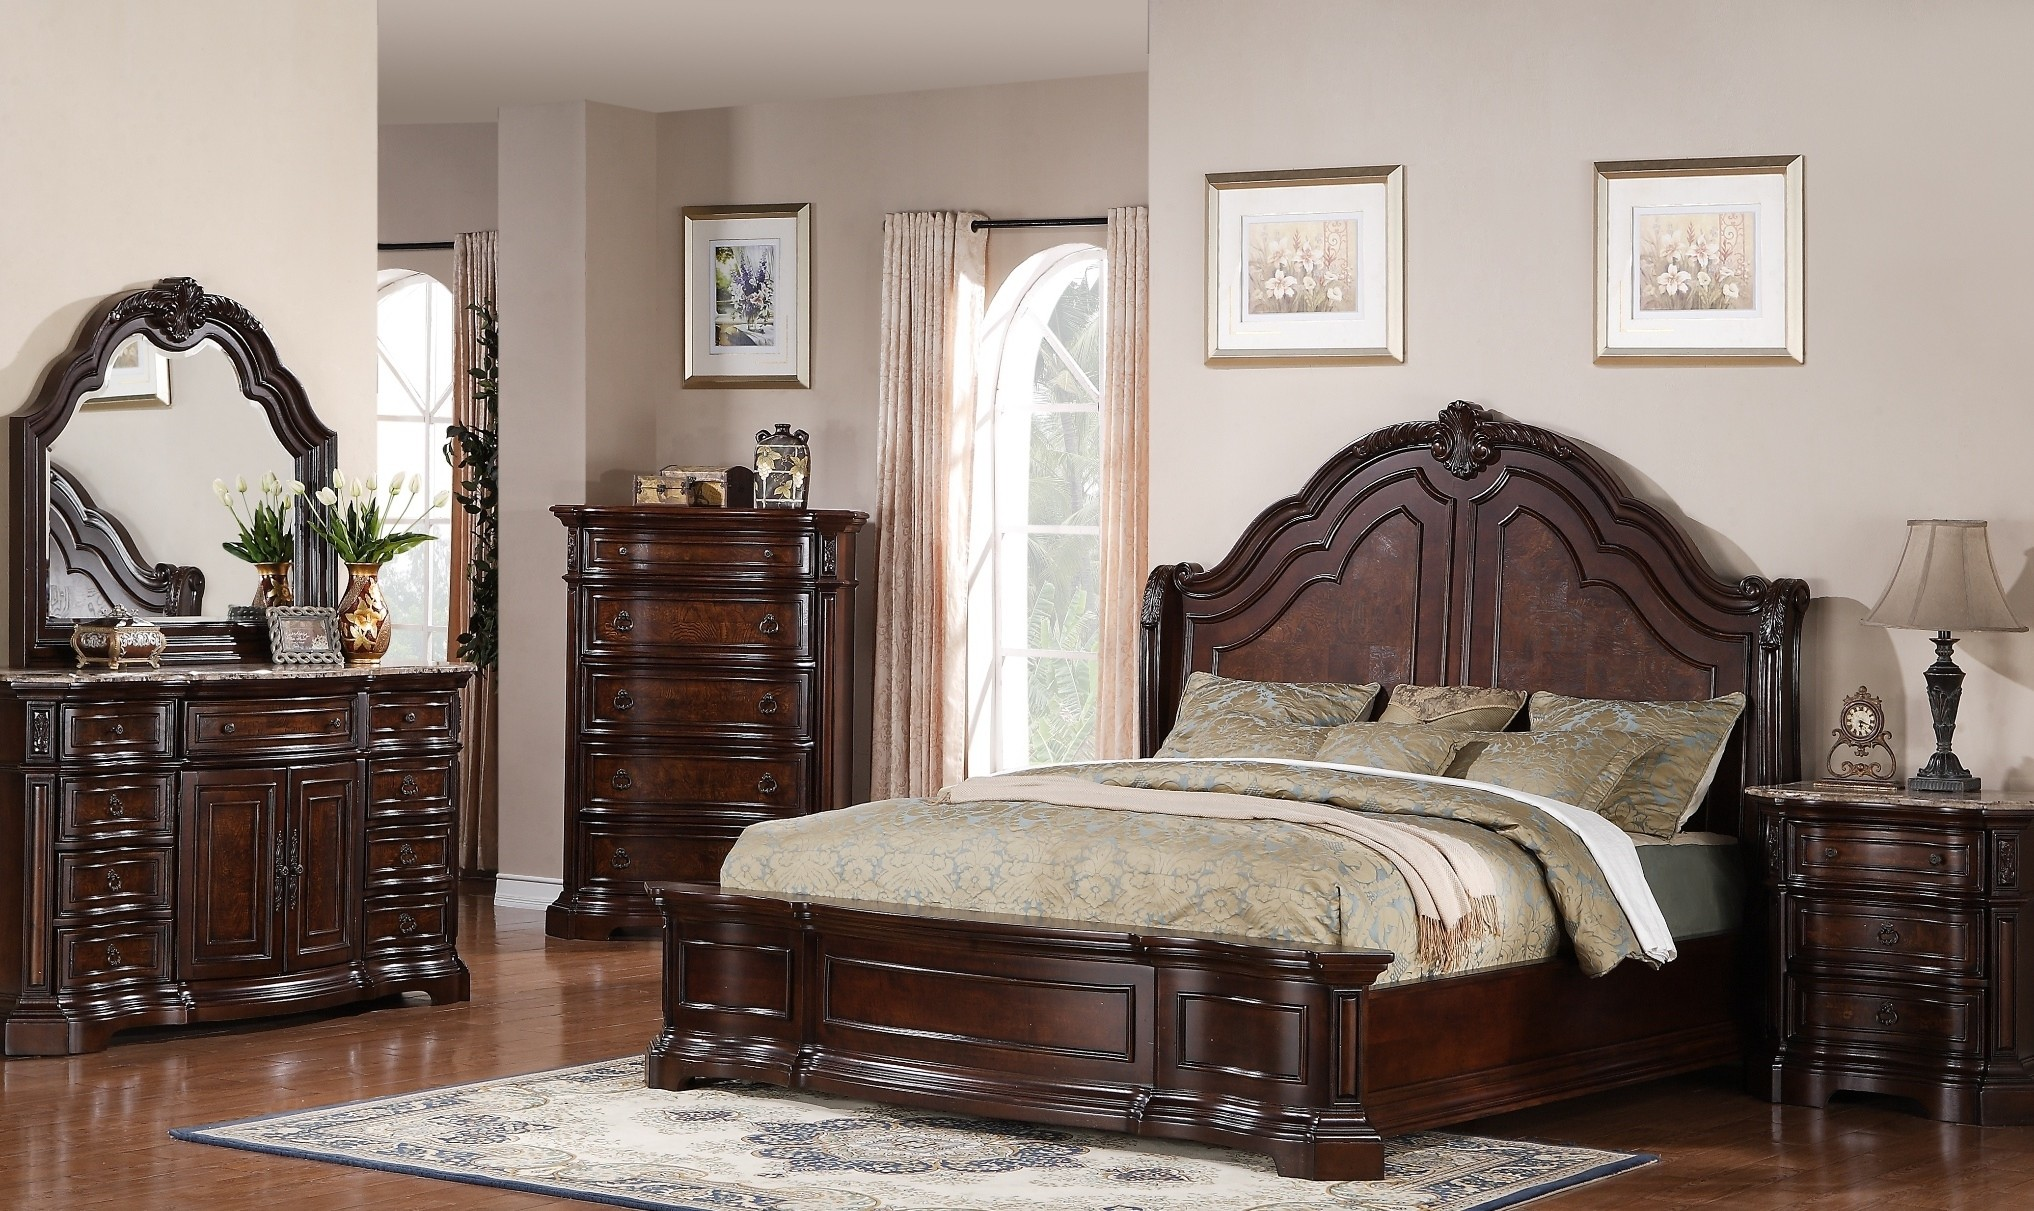 Edington Panel Bedroom Set From Samuel Lawrence (8328 252 259 508) |  Coleman Furniture